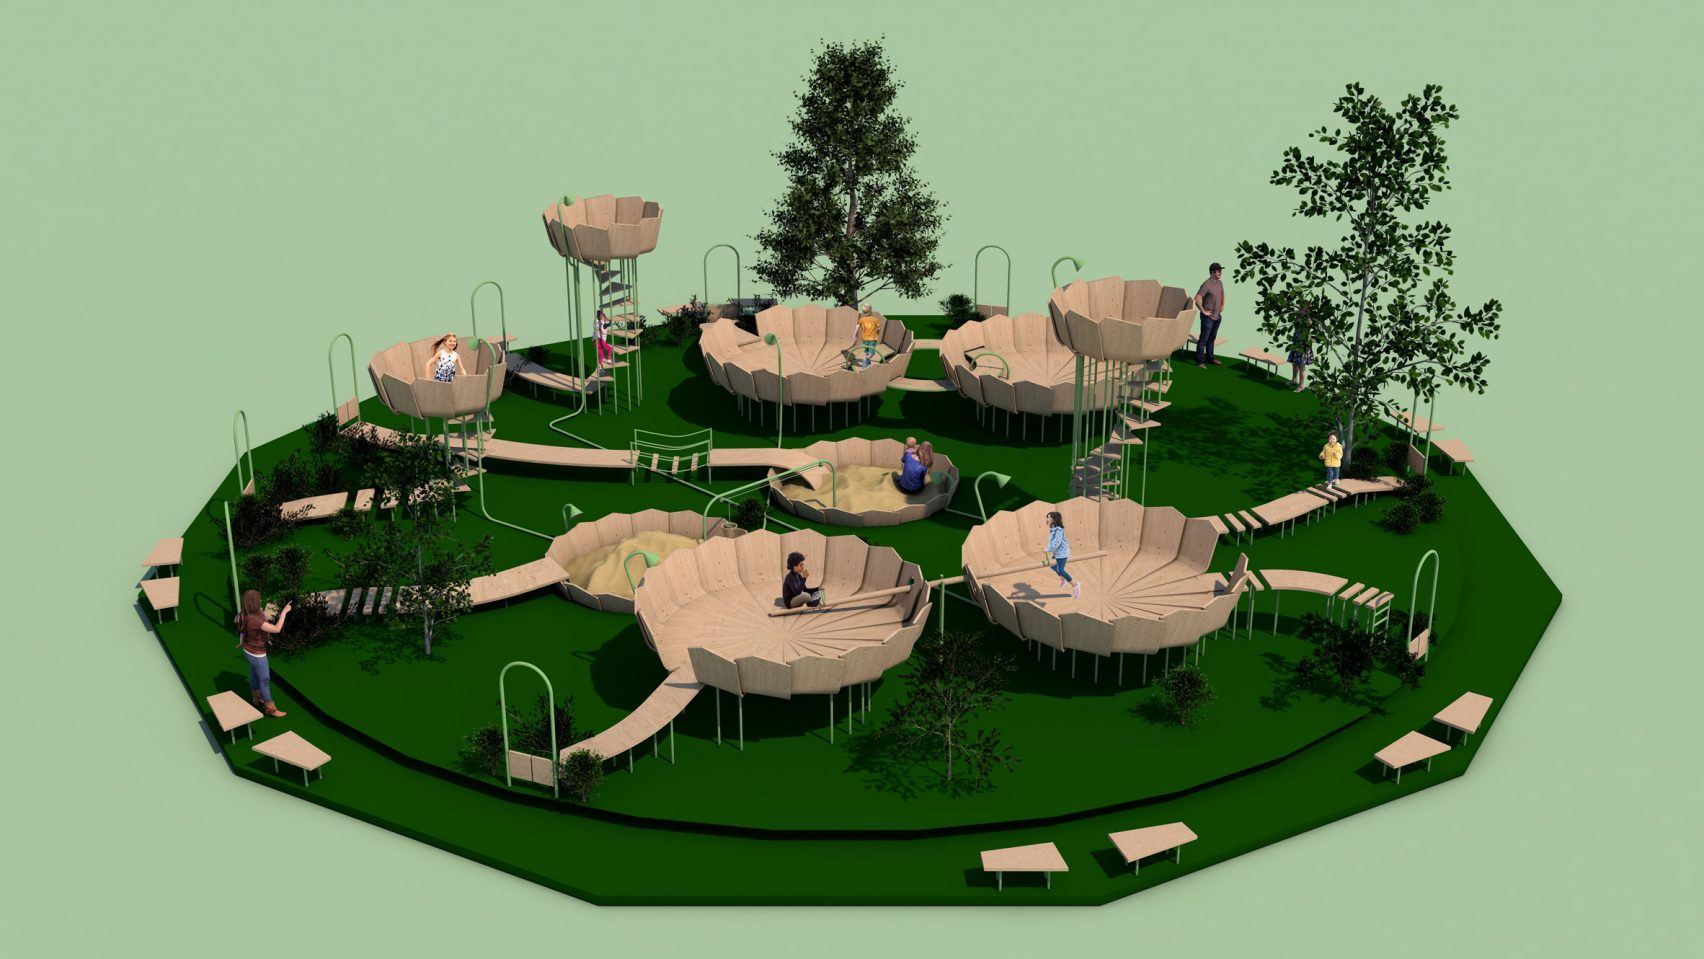 rimbin-playground-concept-design_dezeen_2364_hero-1-1704×959